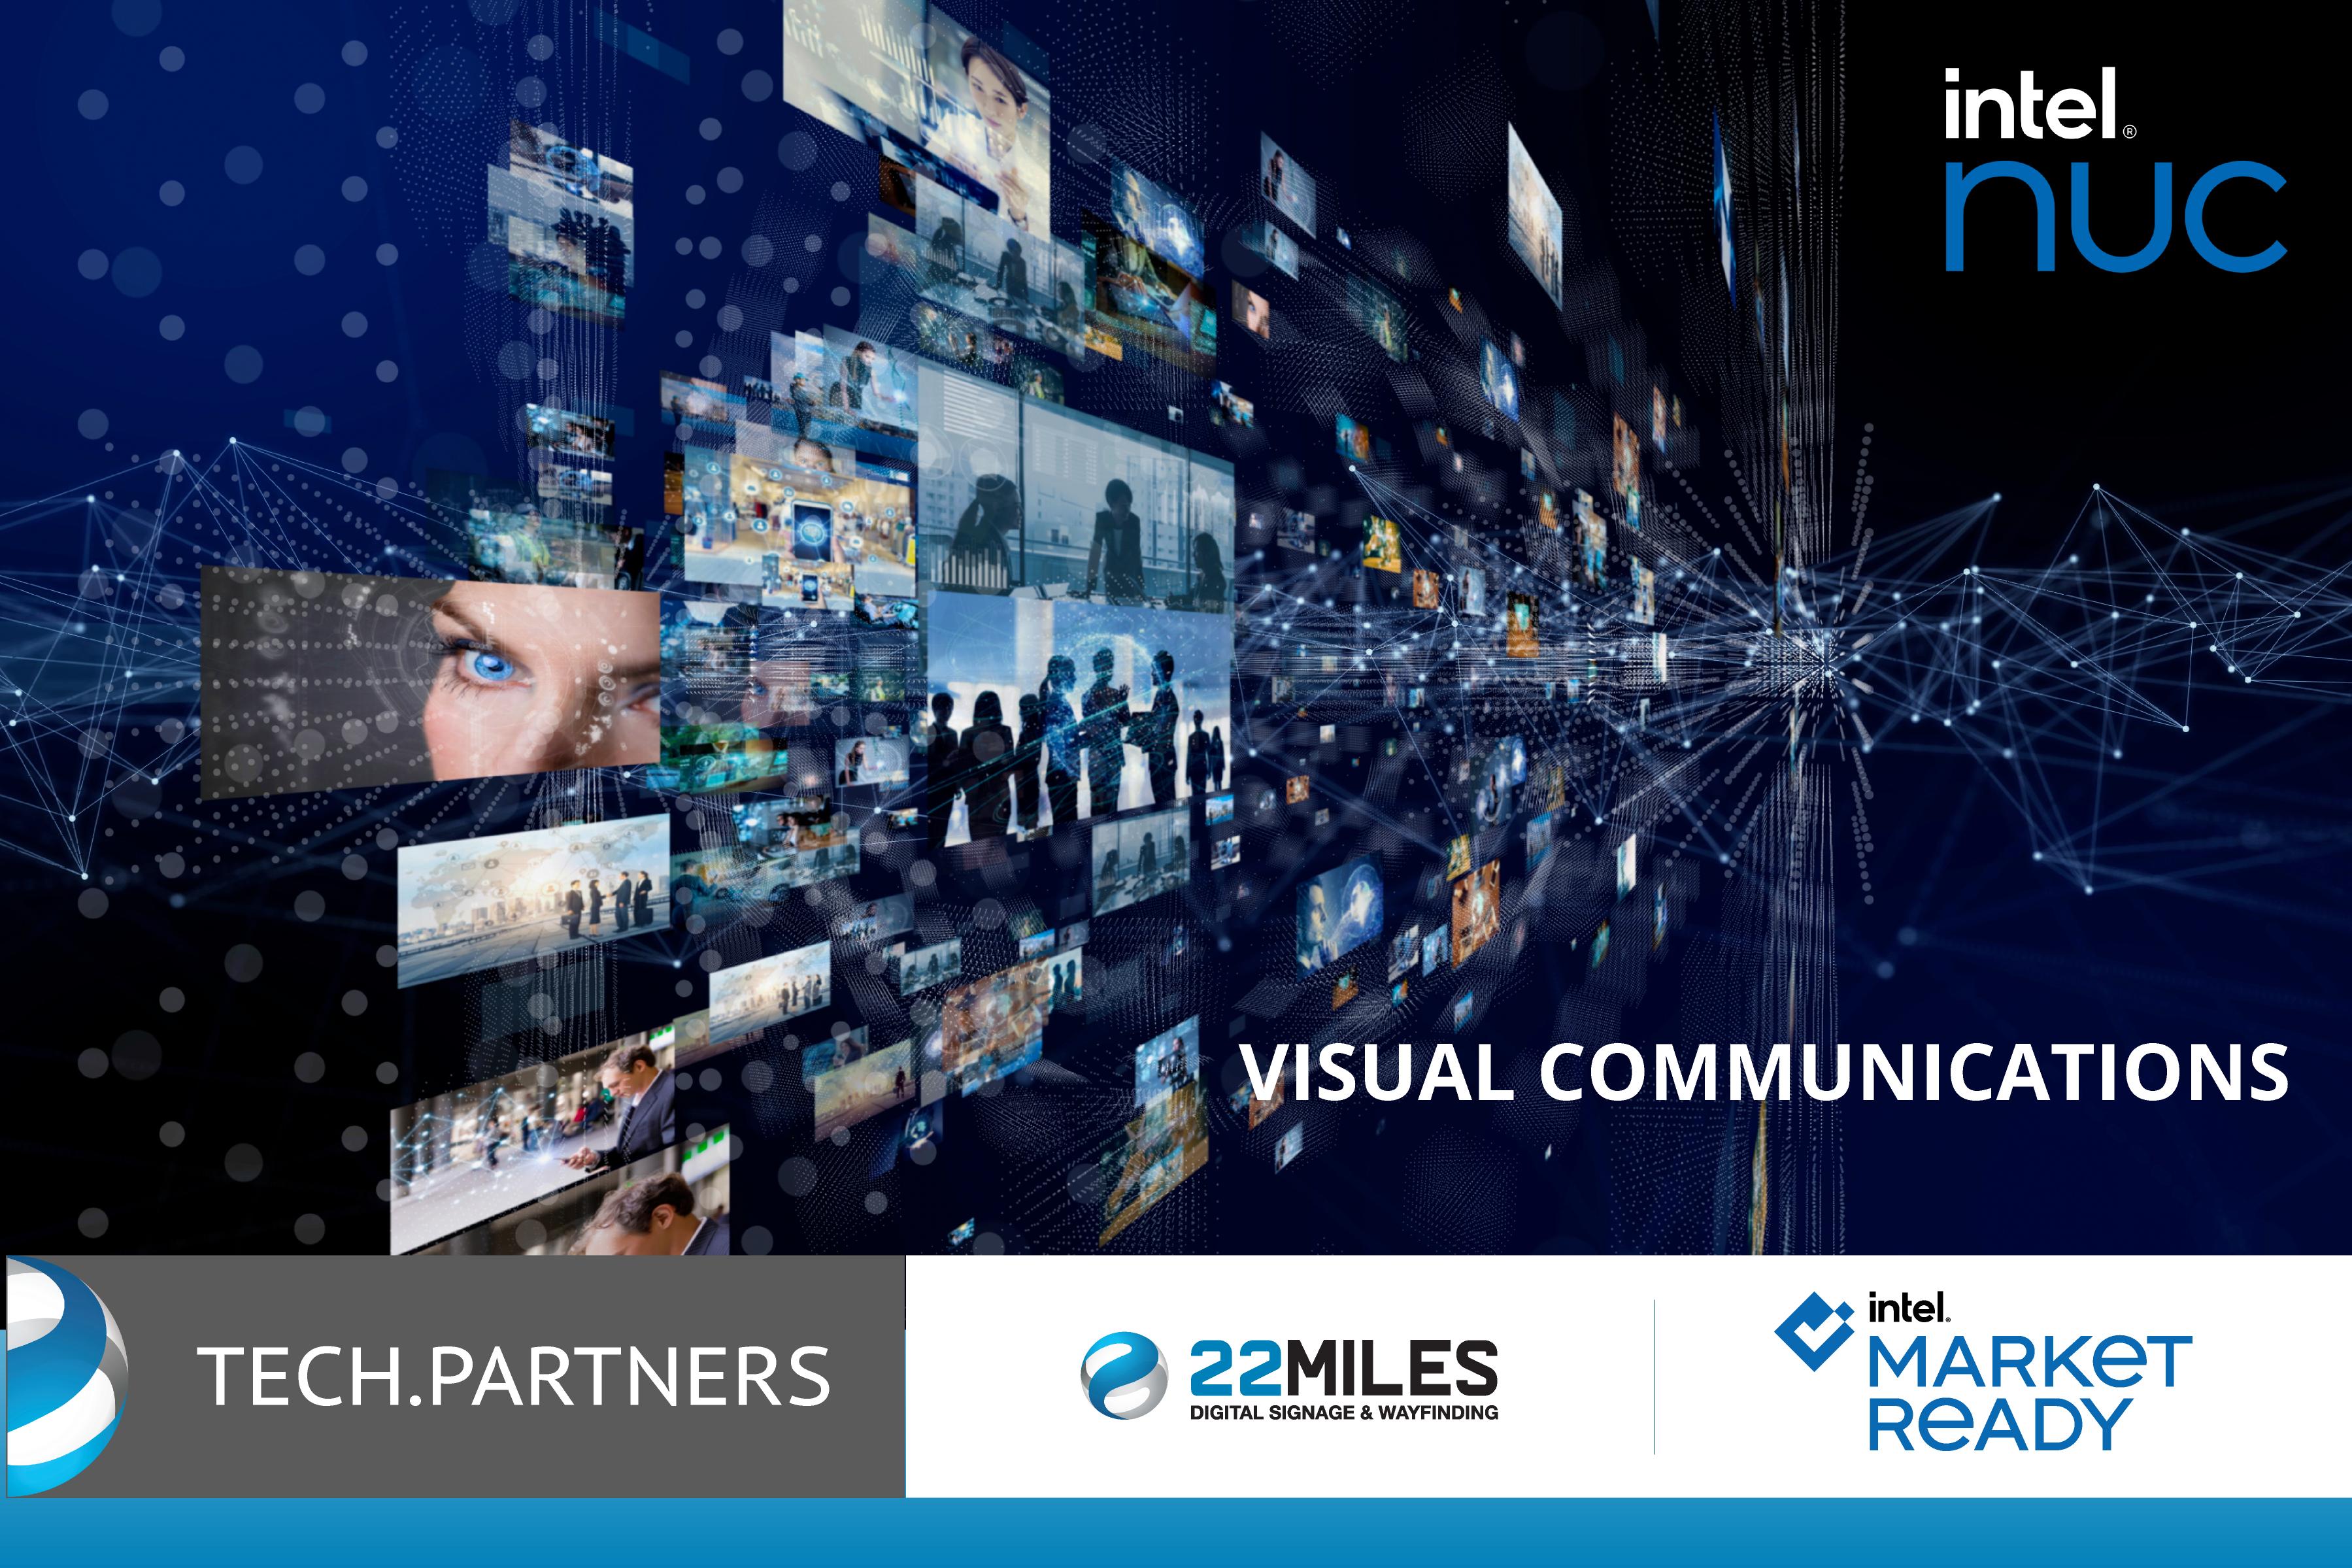 Intel-nuc-visual-Communications-blog